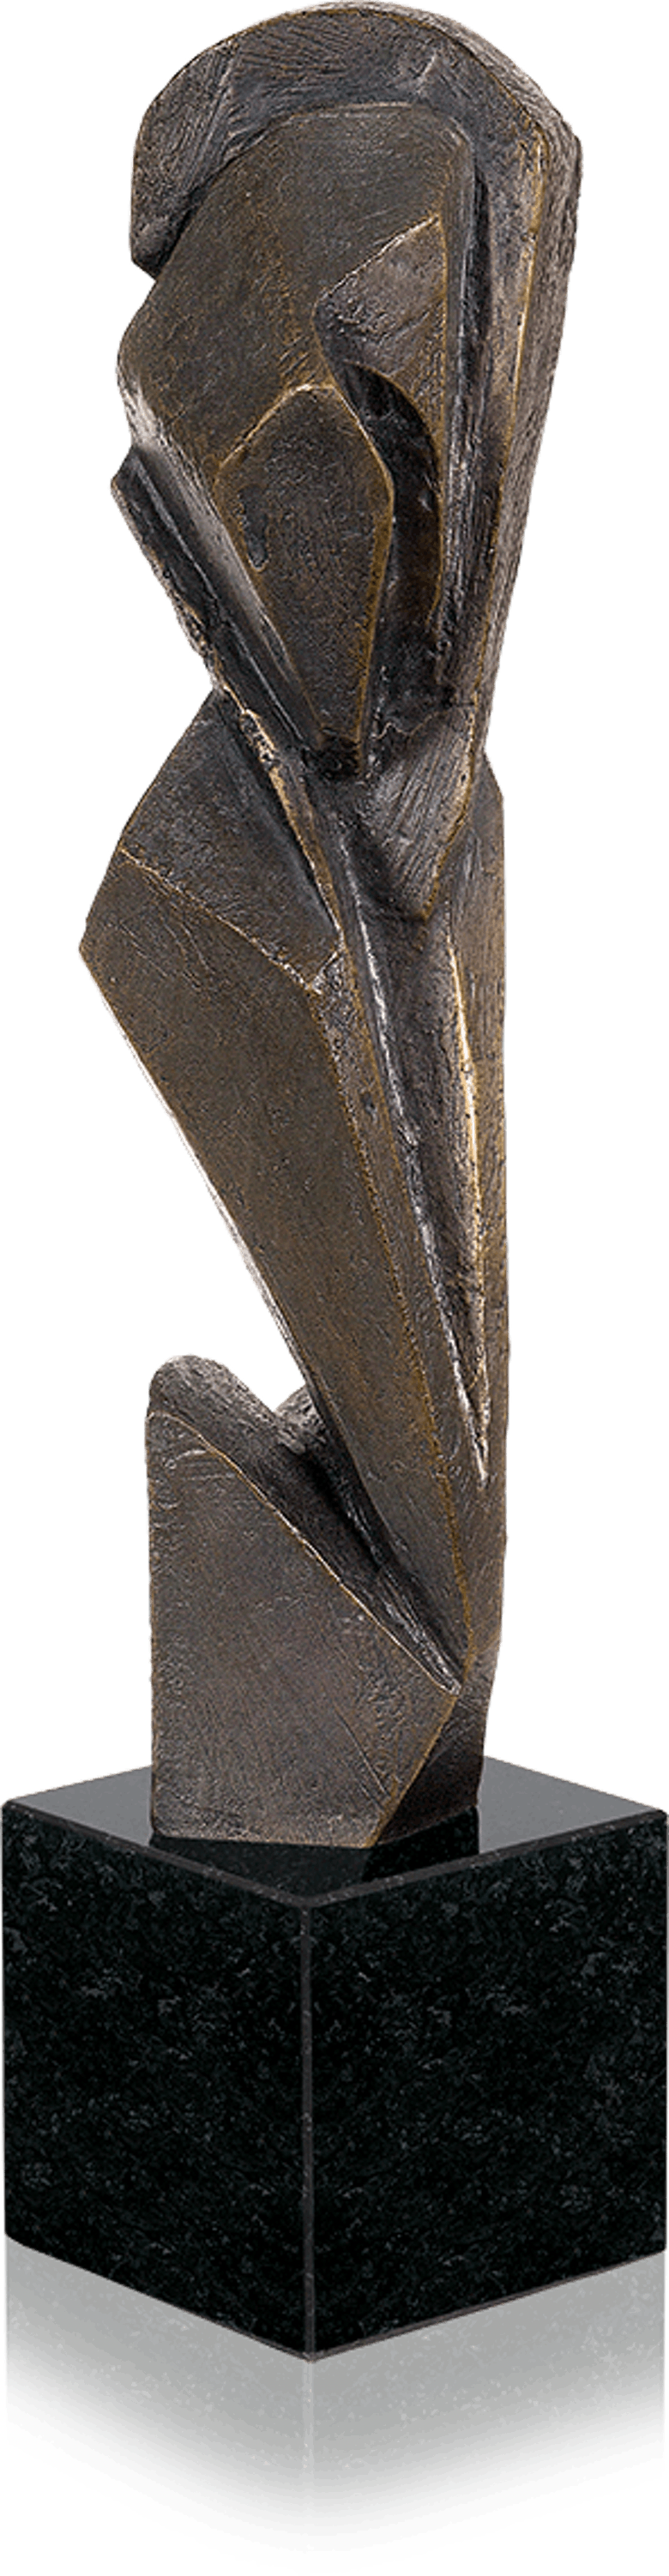 Bronzefigur Vegetamorph von Kay Winkler